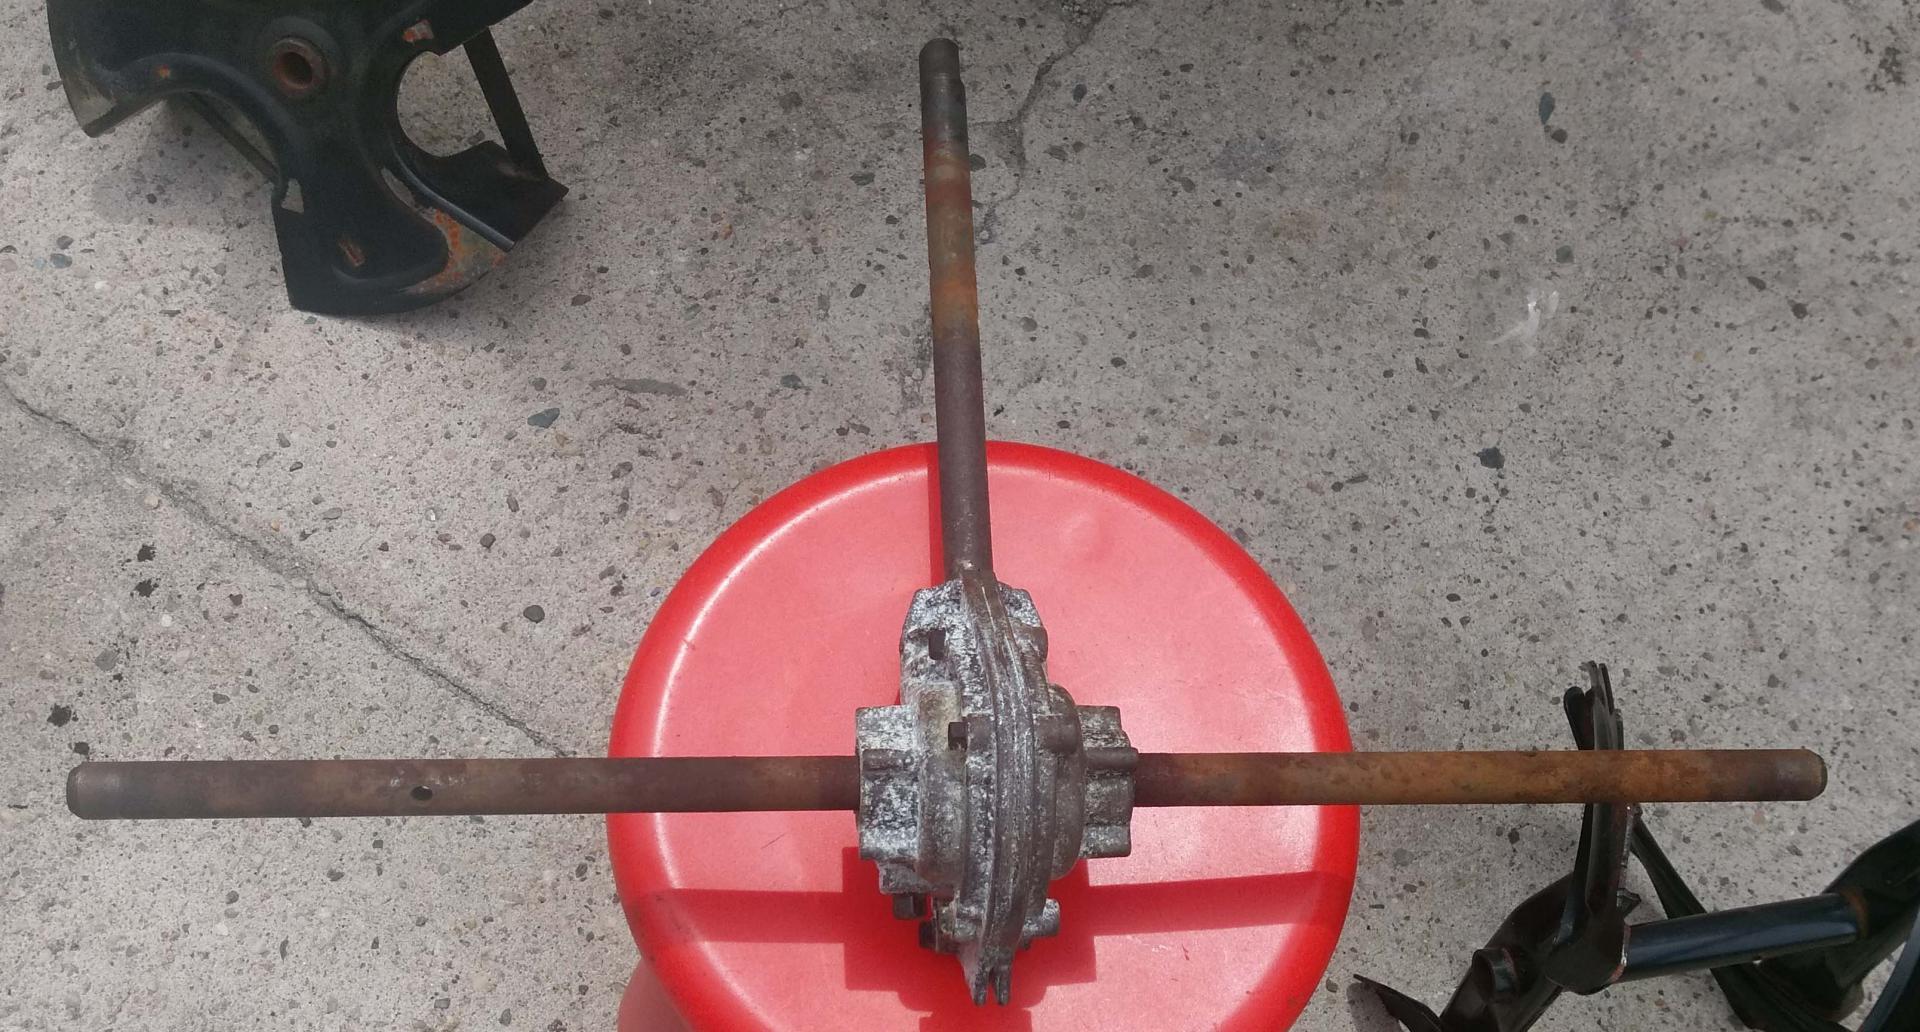 Toro Powermax Rusted shaft, impeller - add zerk fitting ?-imag0810-2.jpg